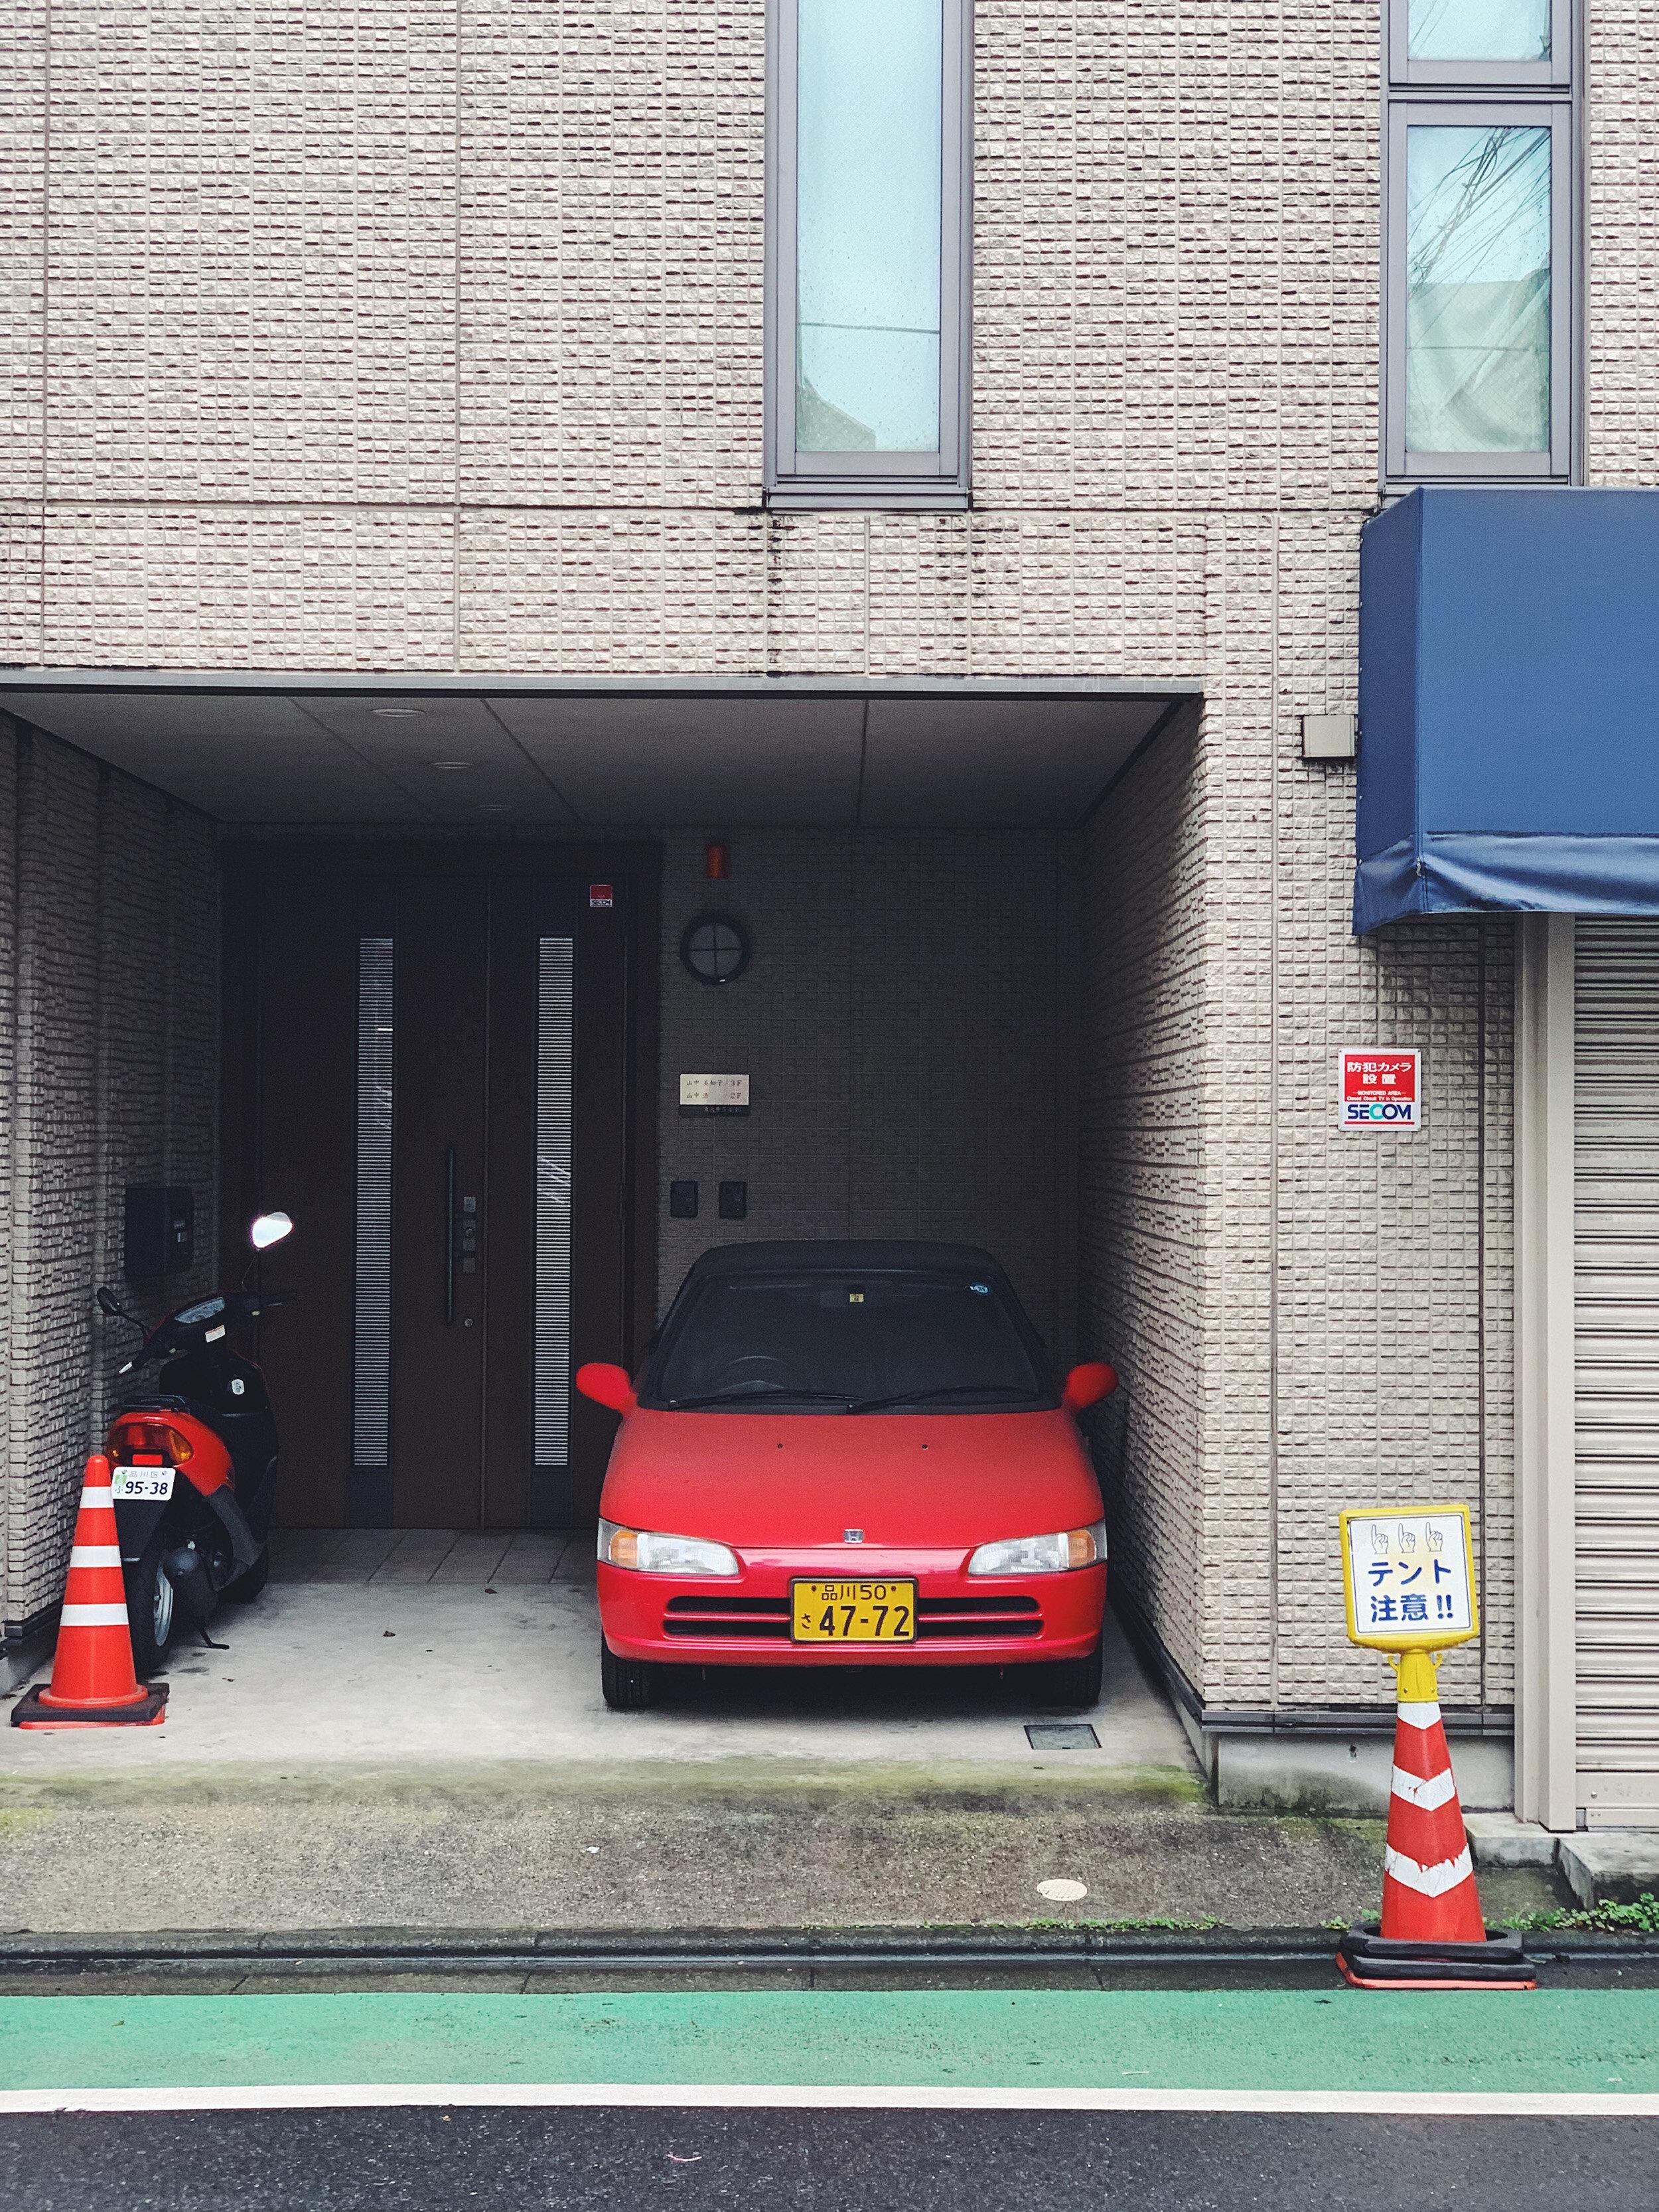 honda-beat-apartment-parking-nakano-japan.JPG